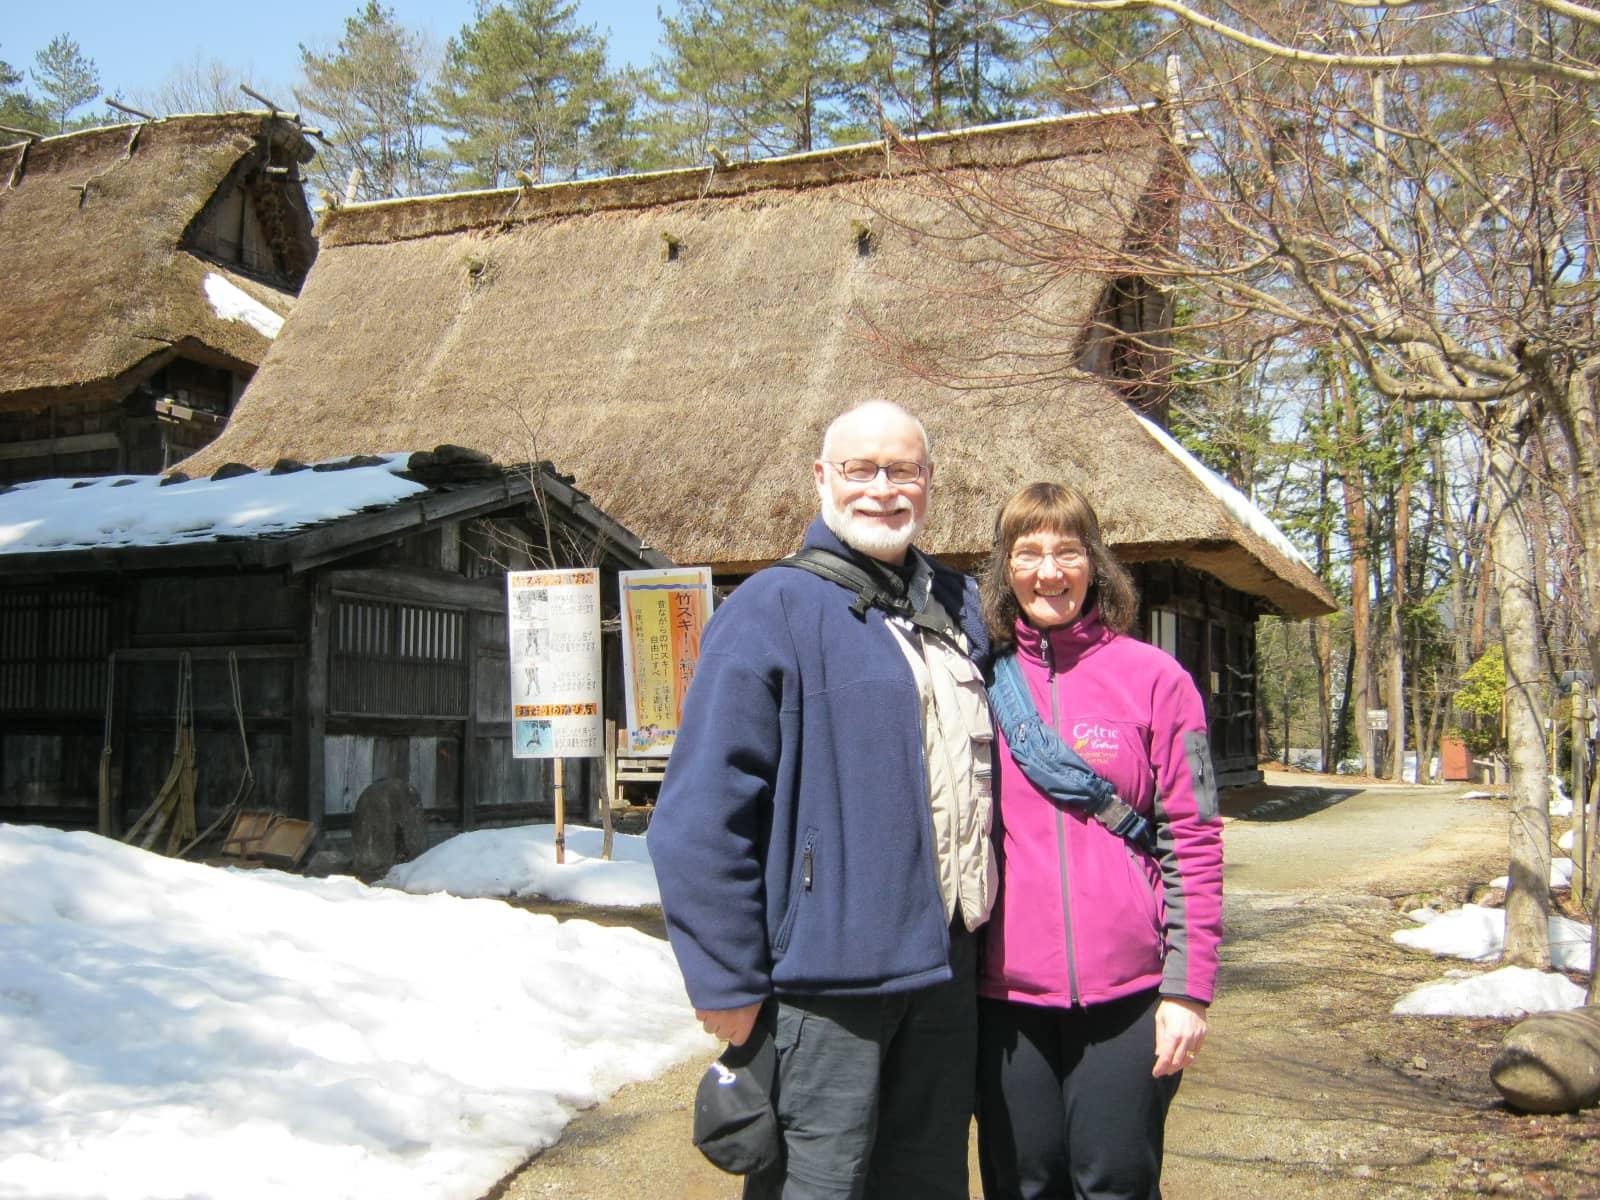 Sally & James from Amherst, Nova Scotia, Canada